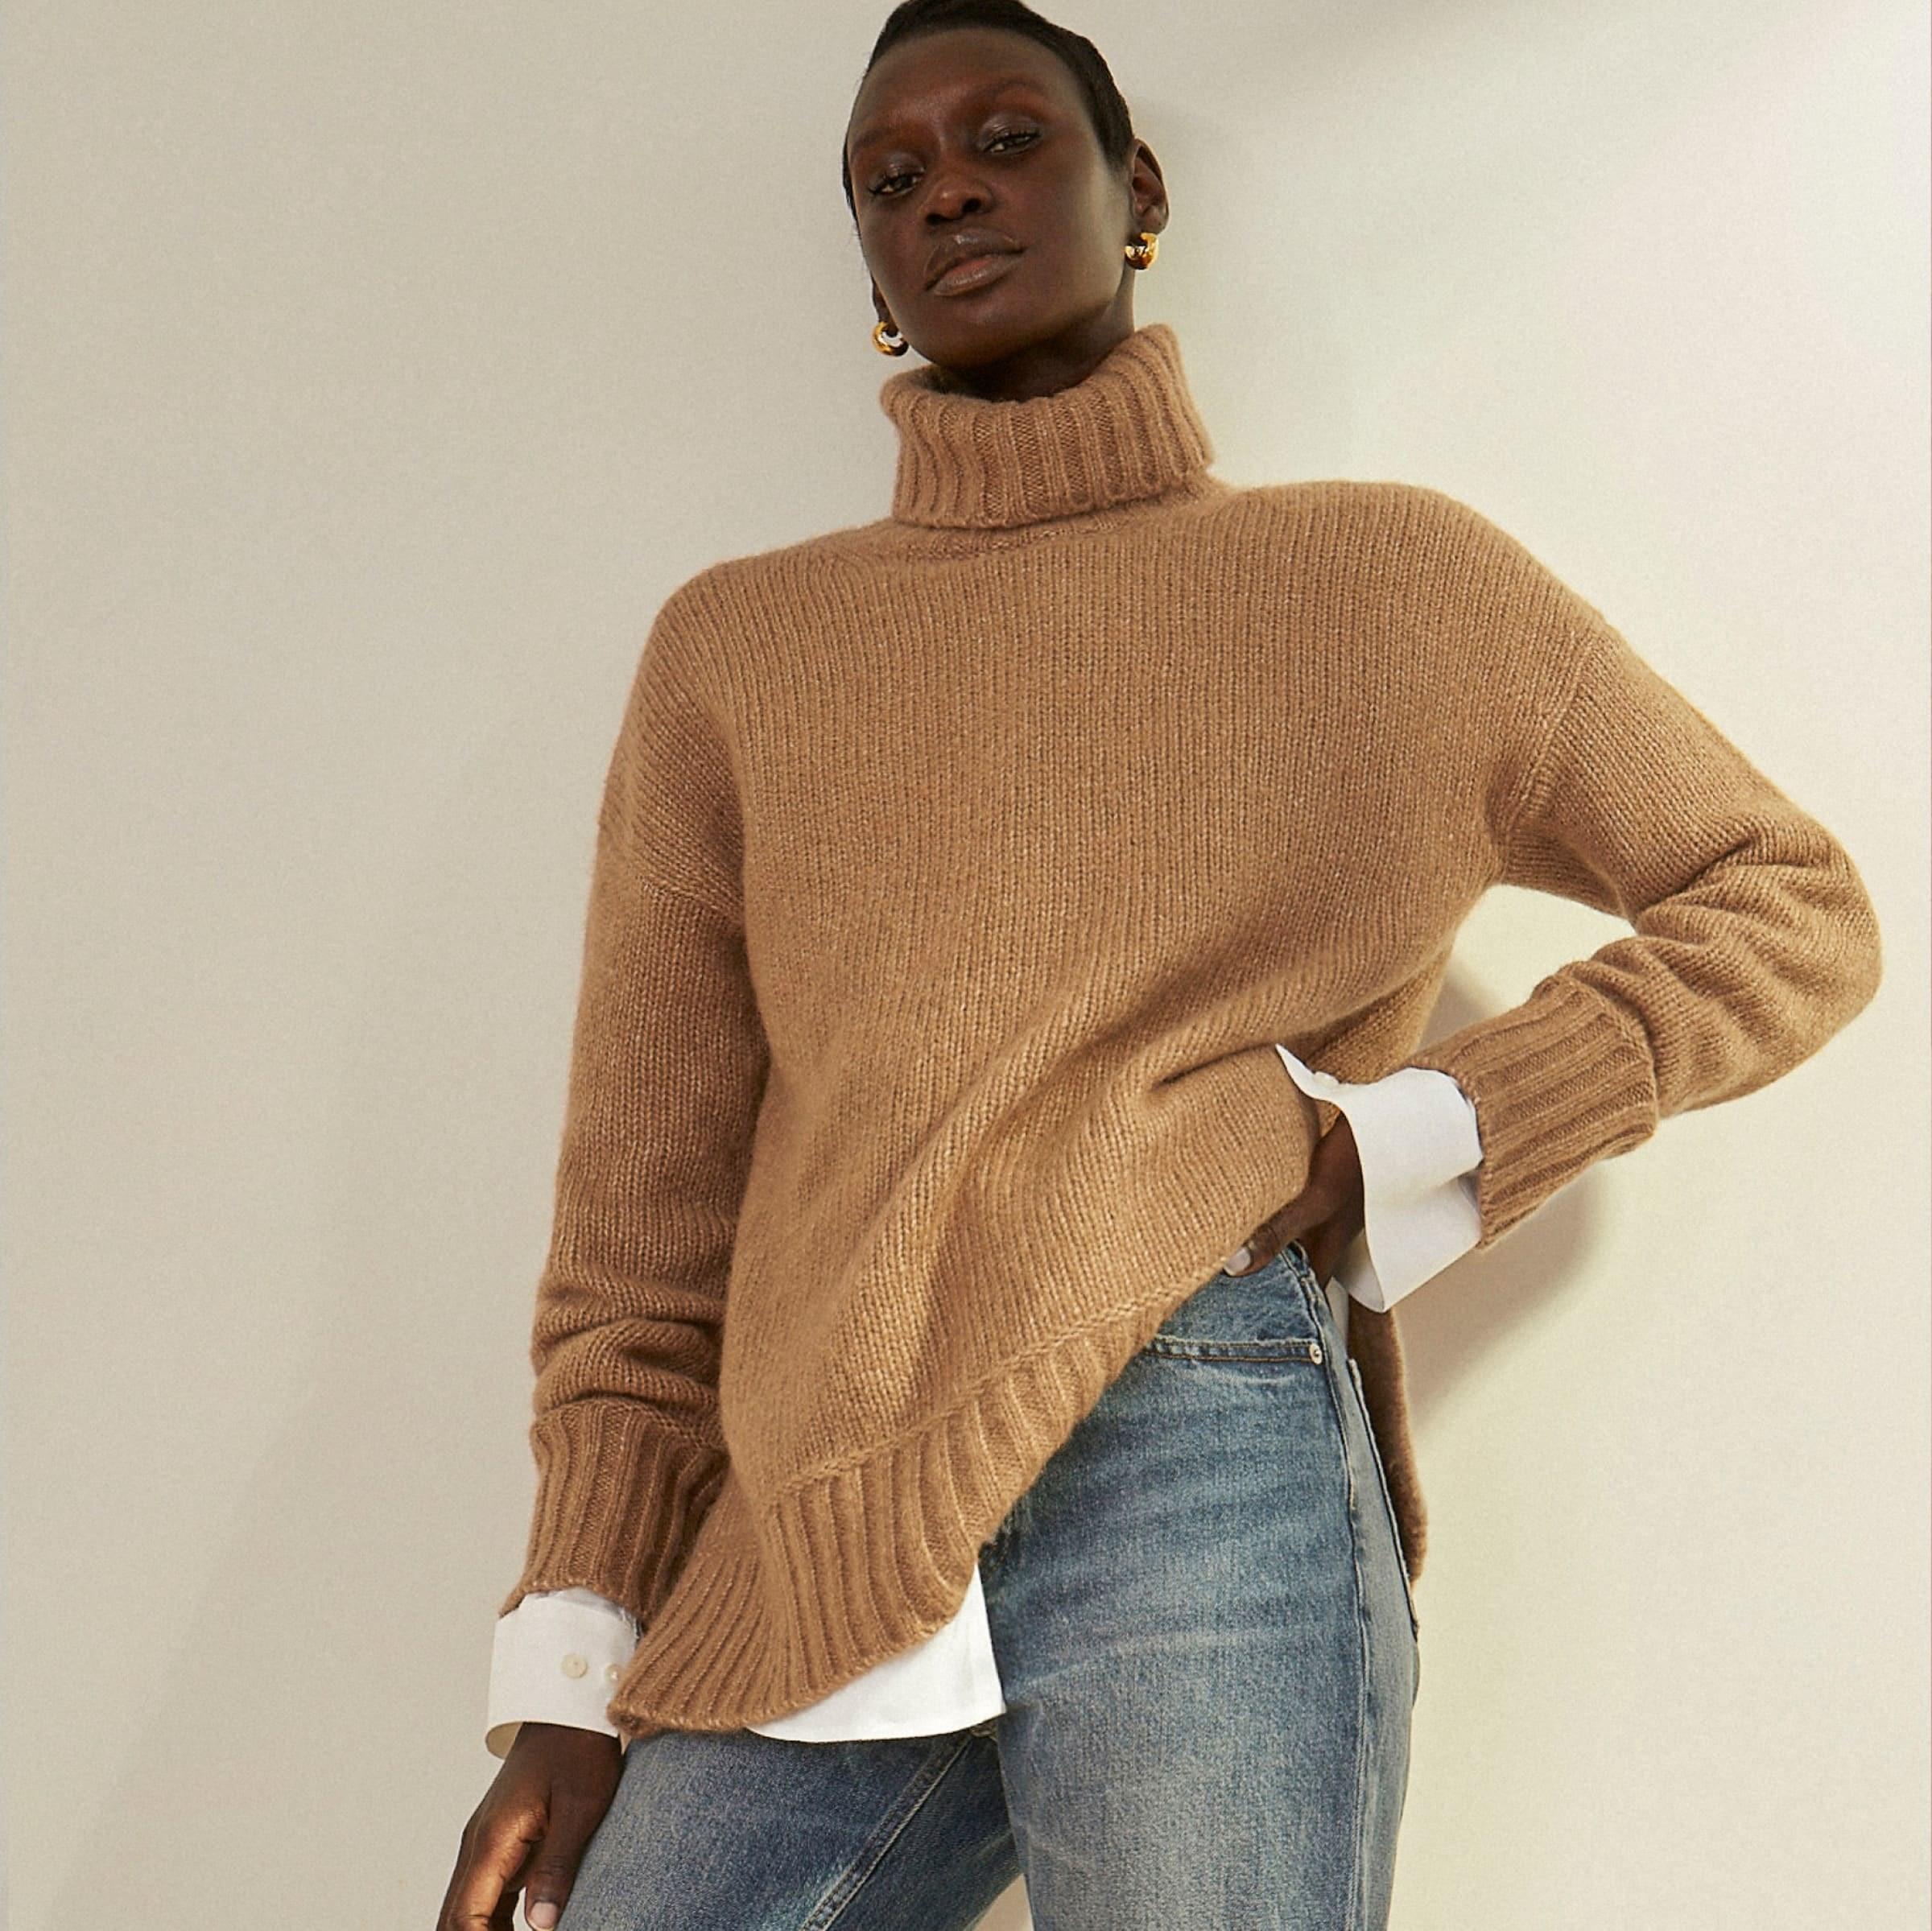 Model wearing brown turtleneck sweater